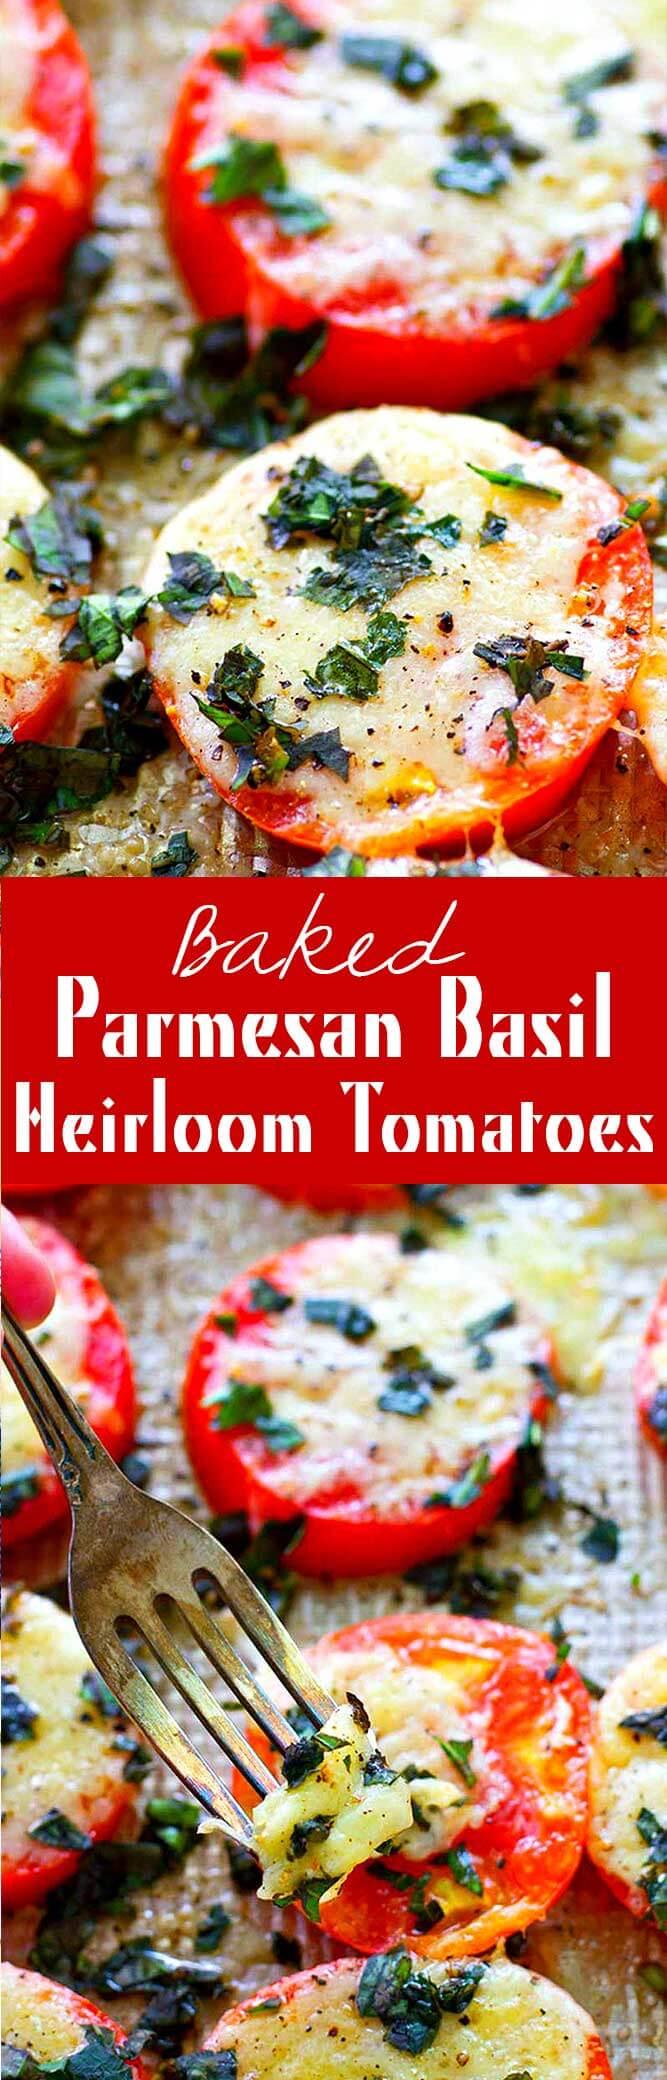 Basked Parmesan Basil Heirloom Tomatoes